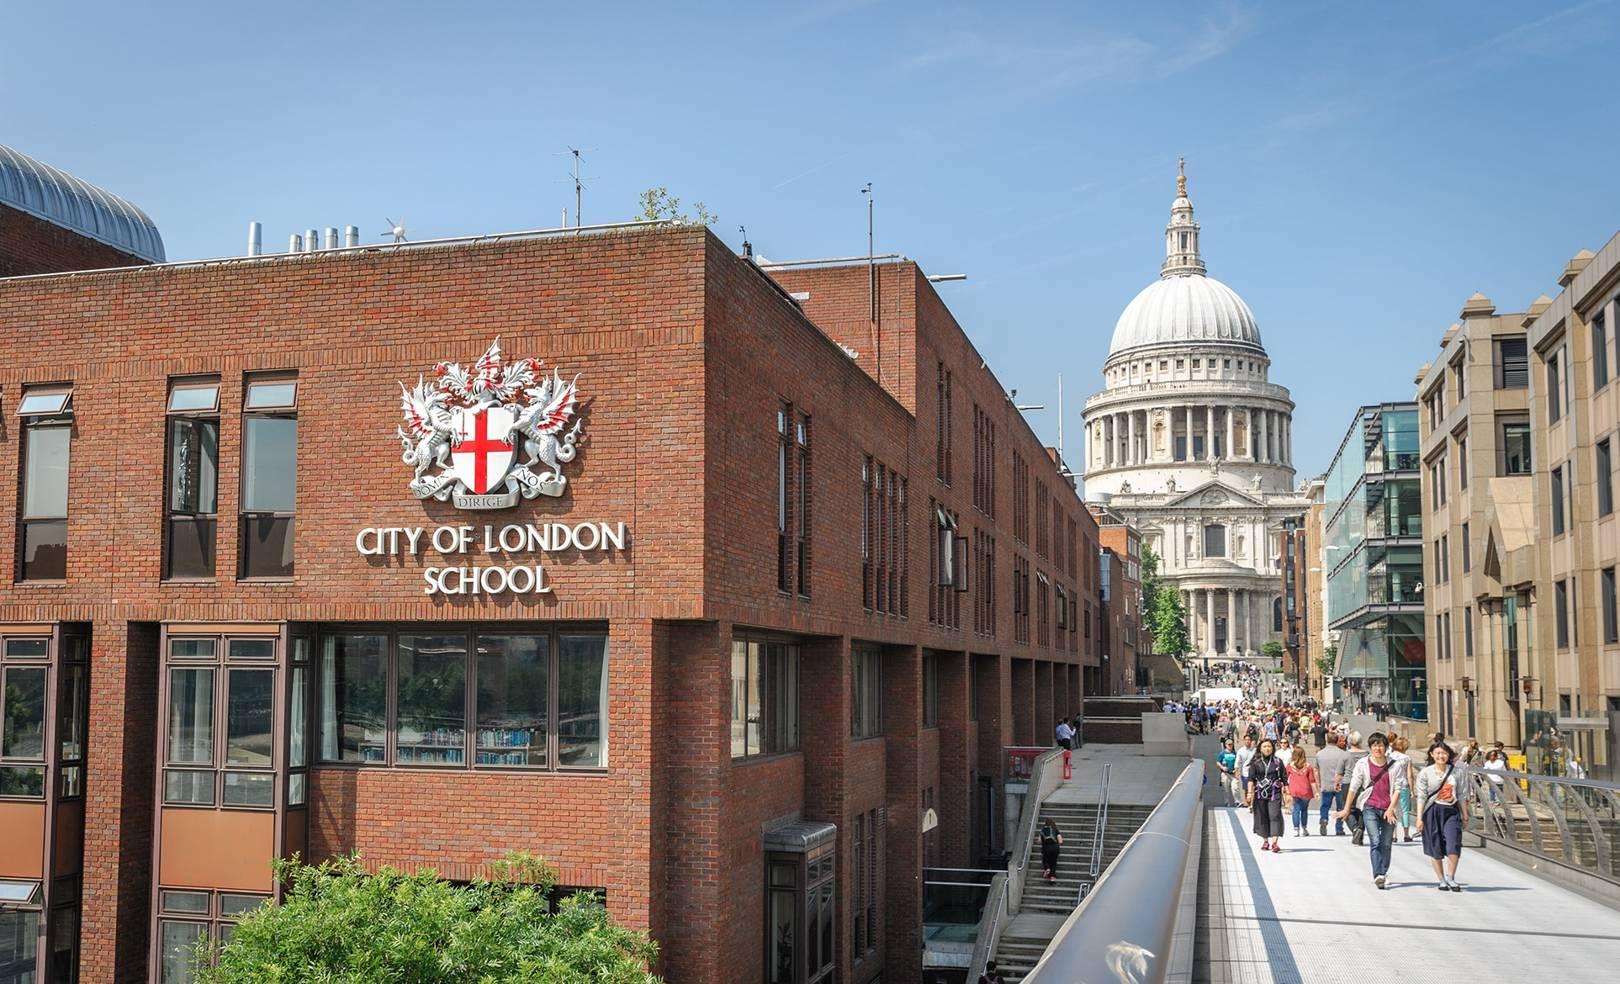 ● City of London School